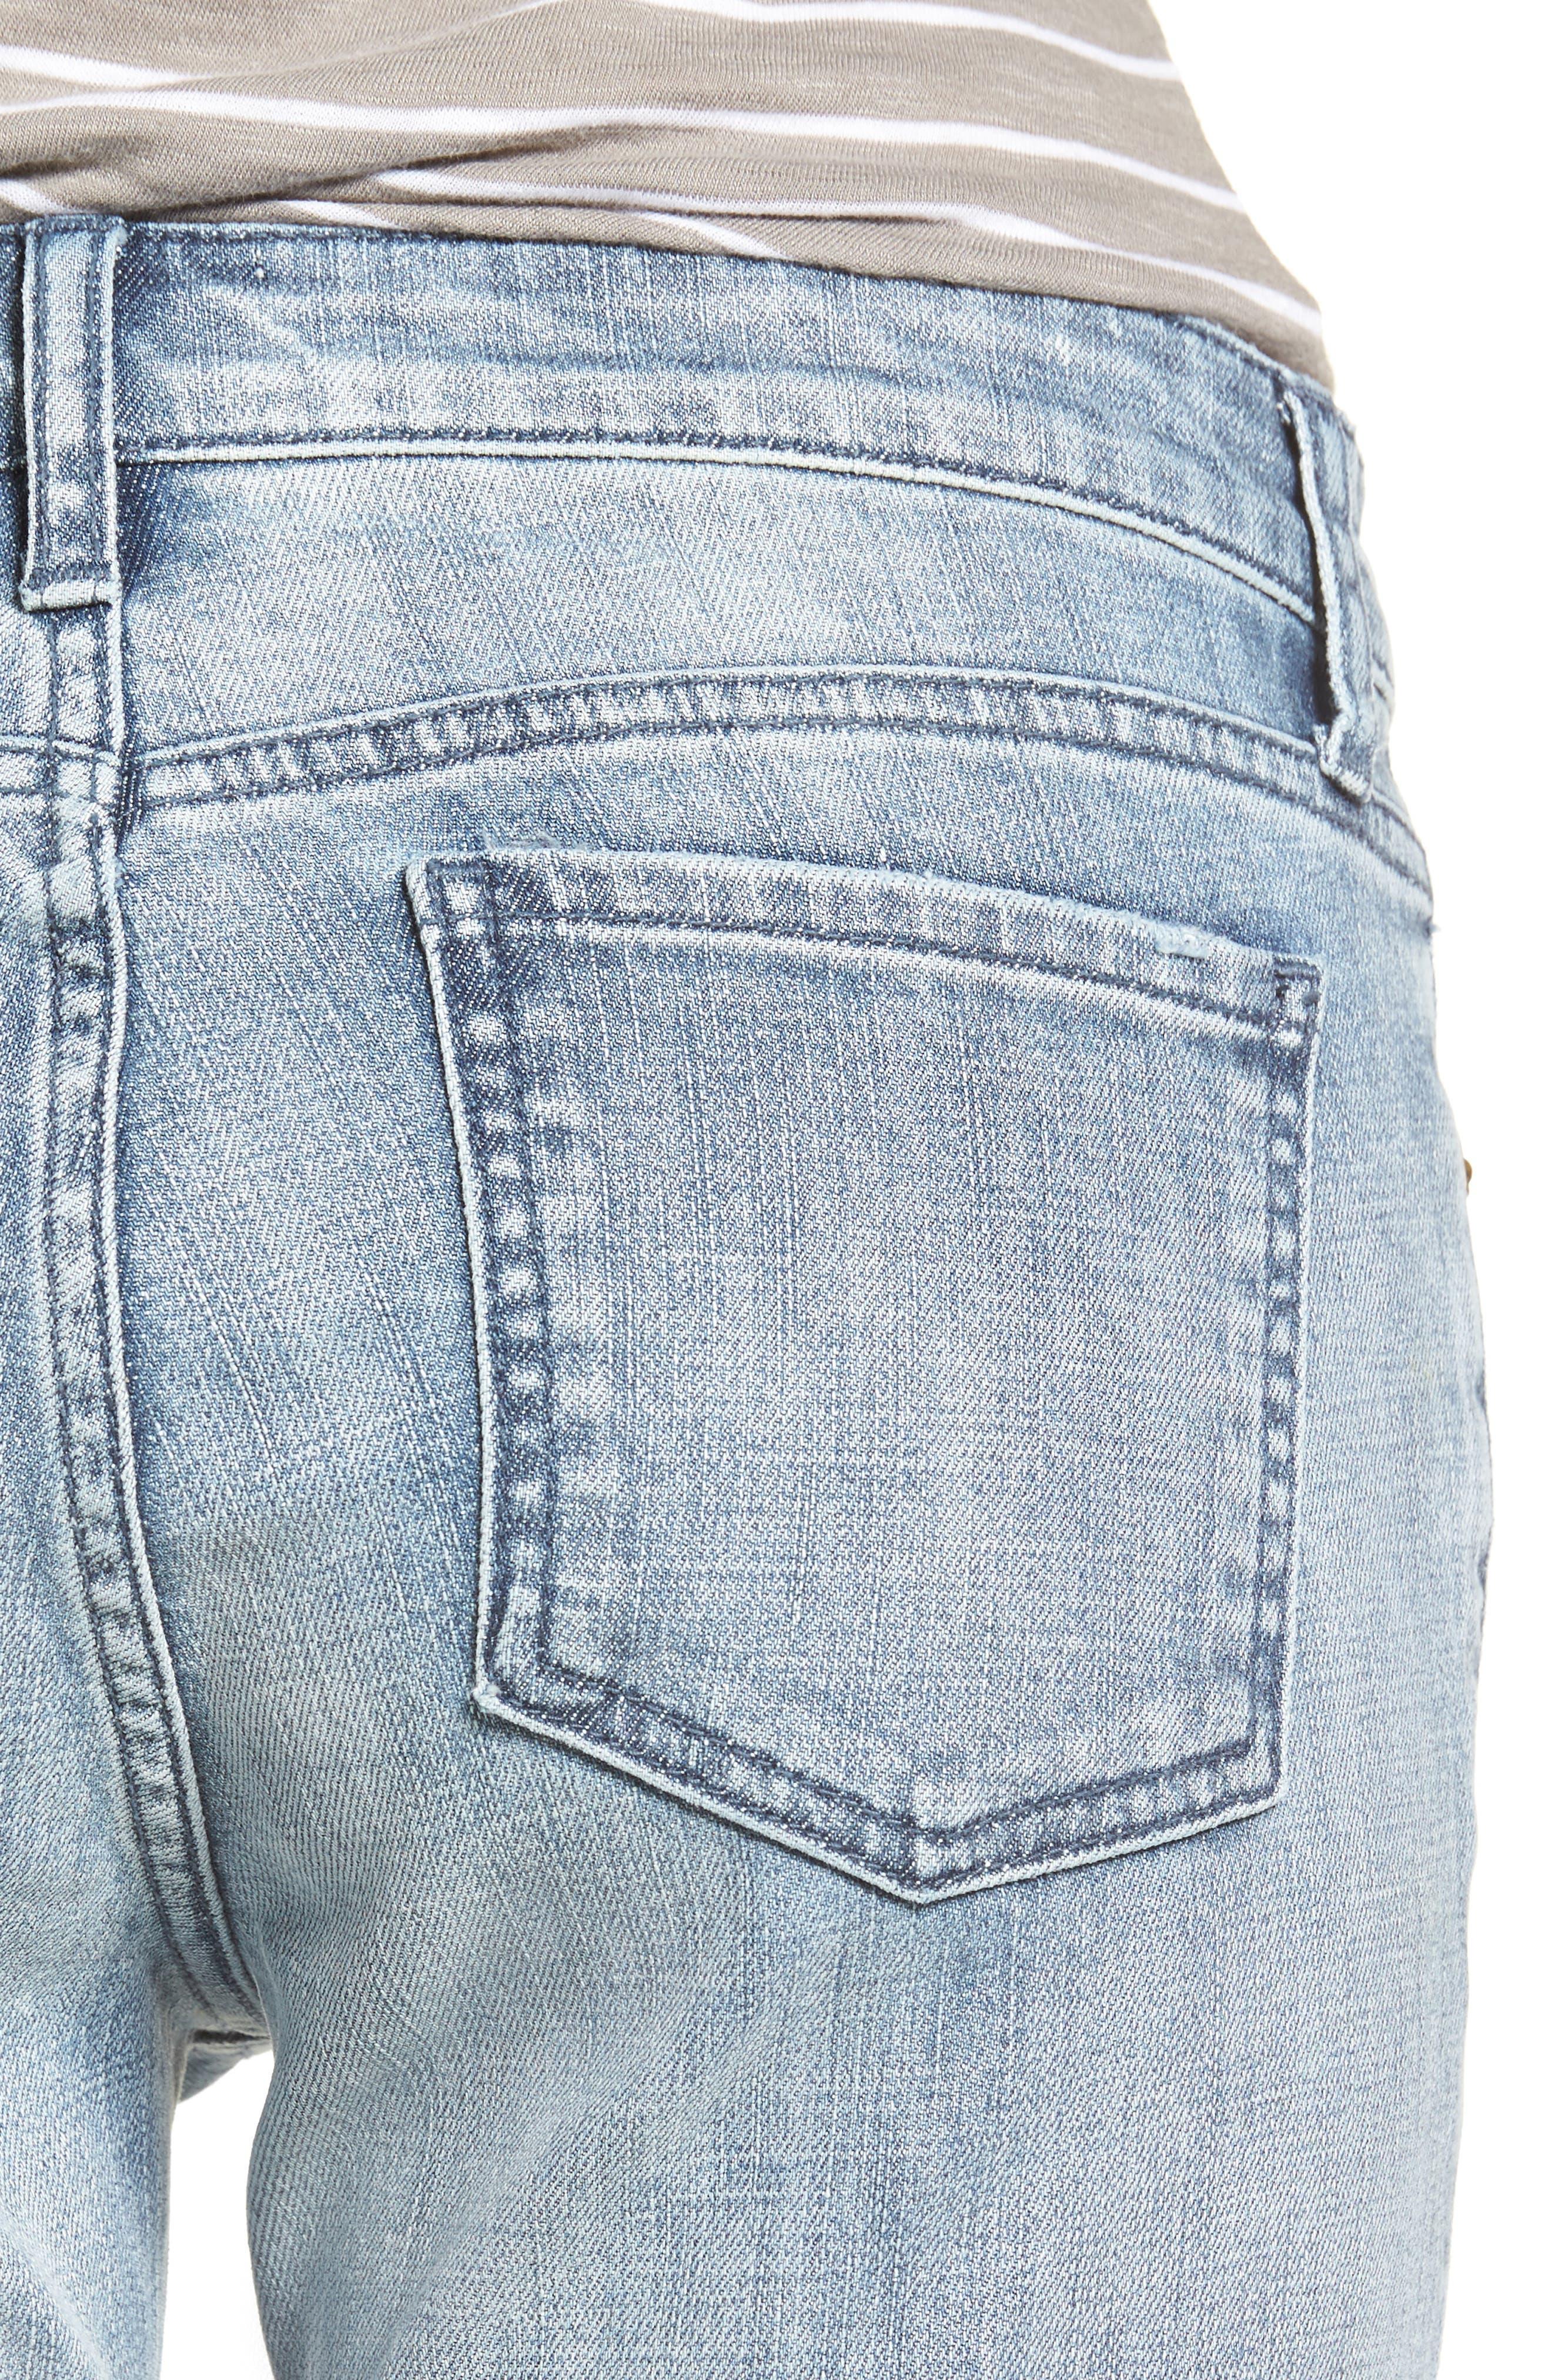 Alternate Image 4  - KUT from the Kloth Catherine Distressed Frayed Hem Boyfriend Jeans (Heartiness)